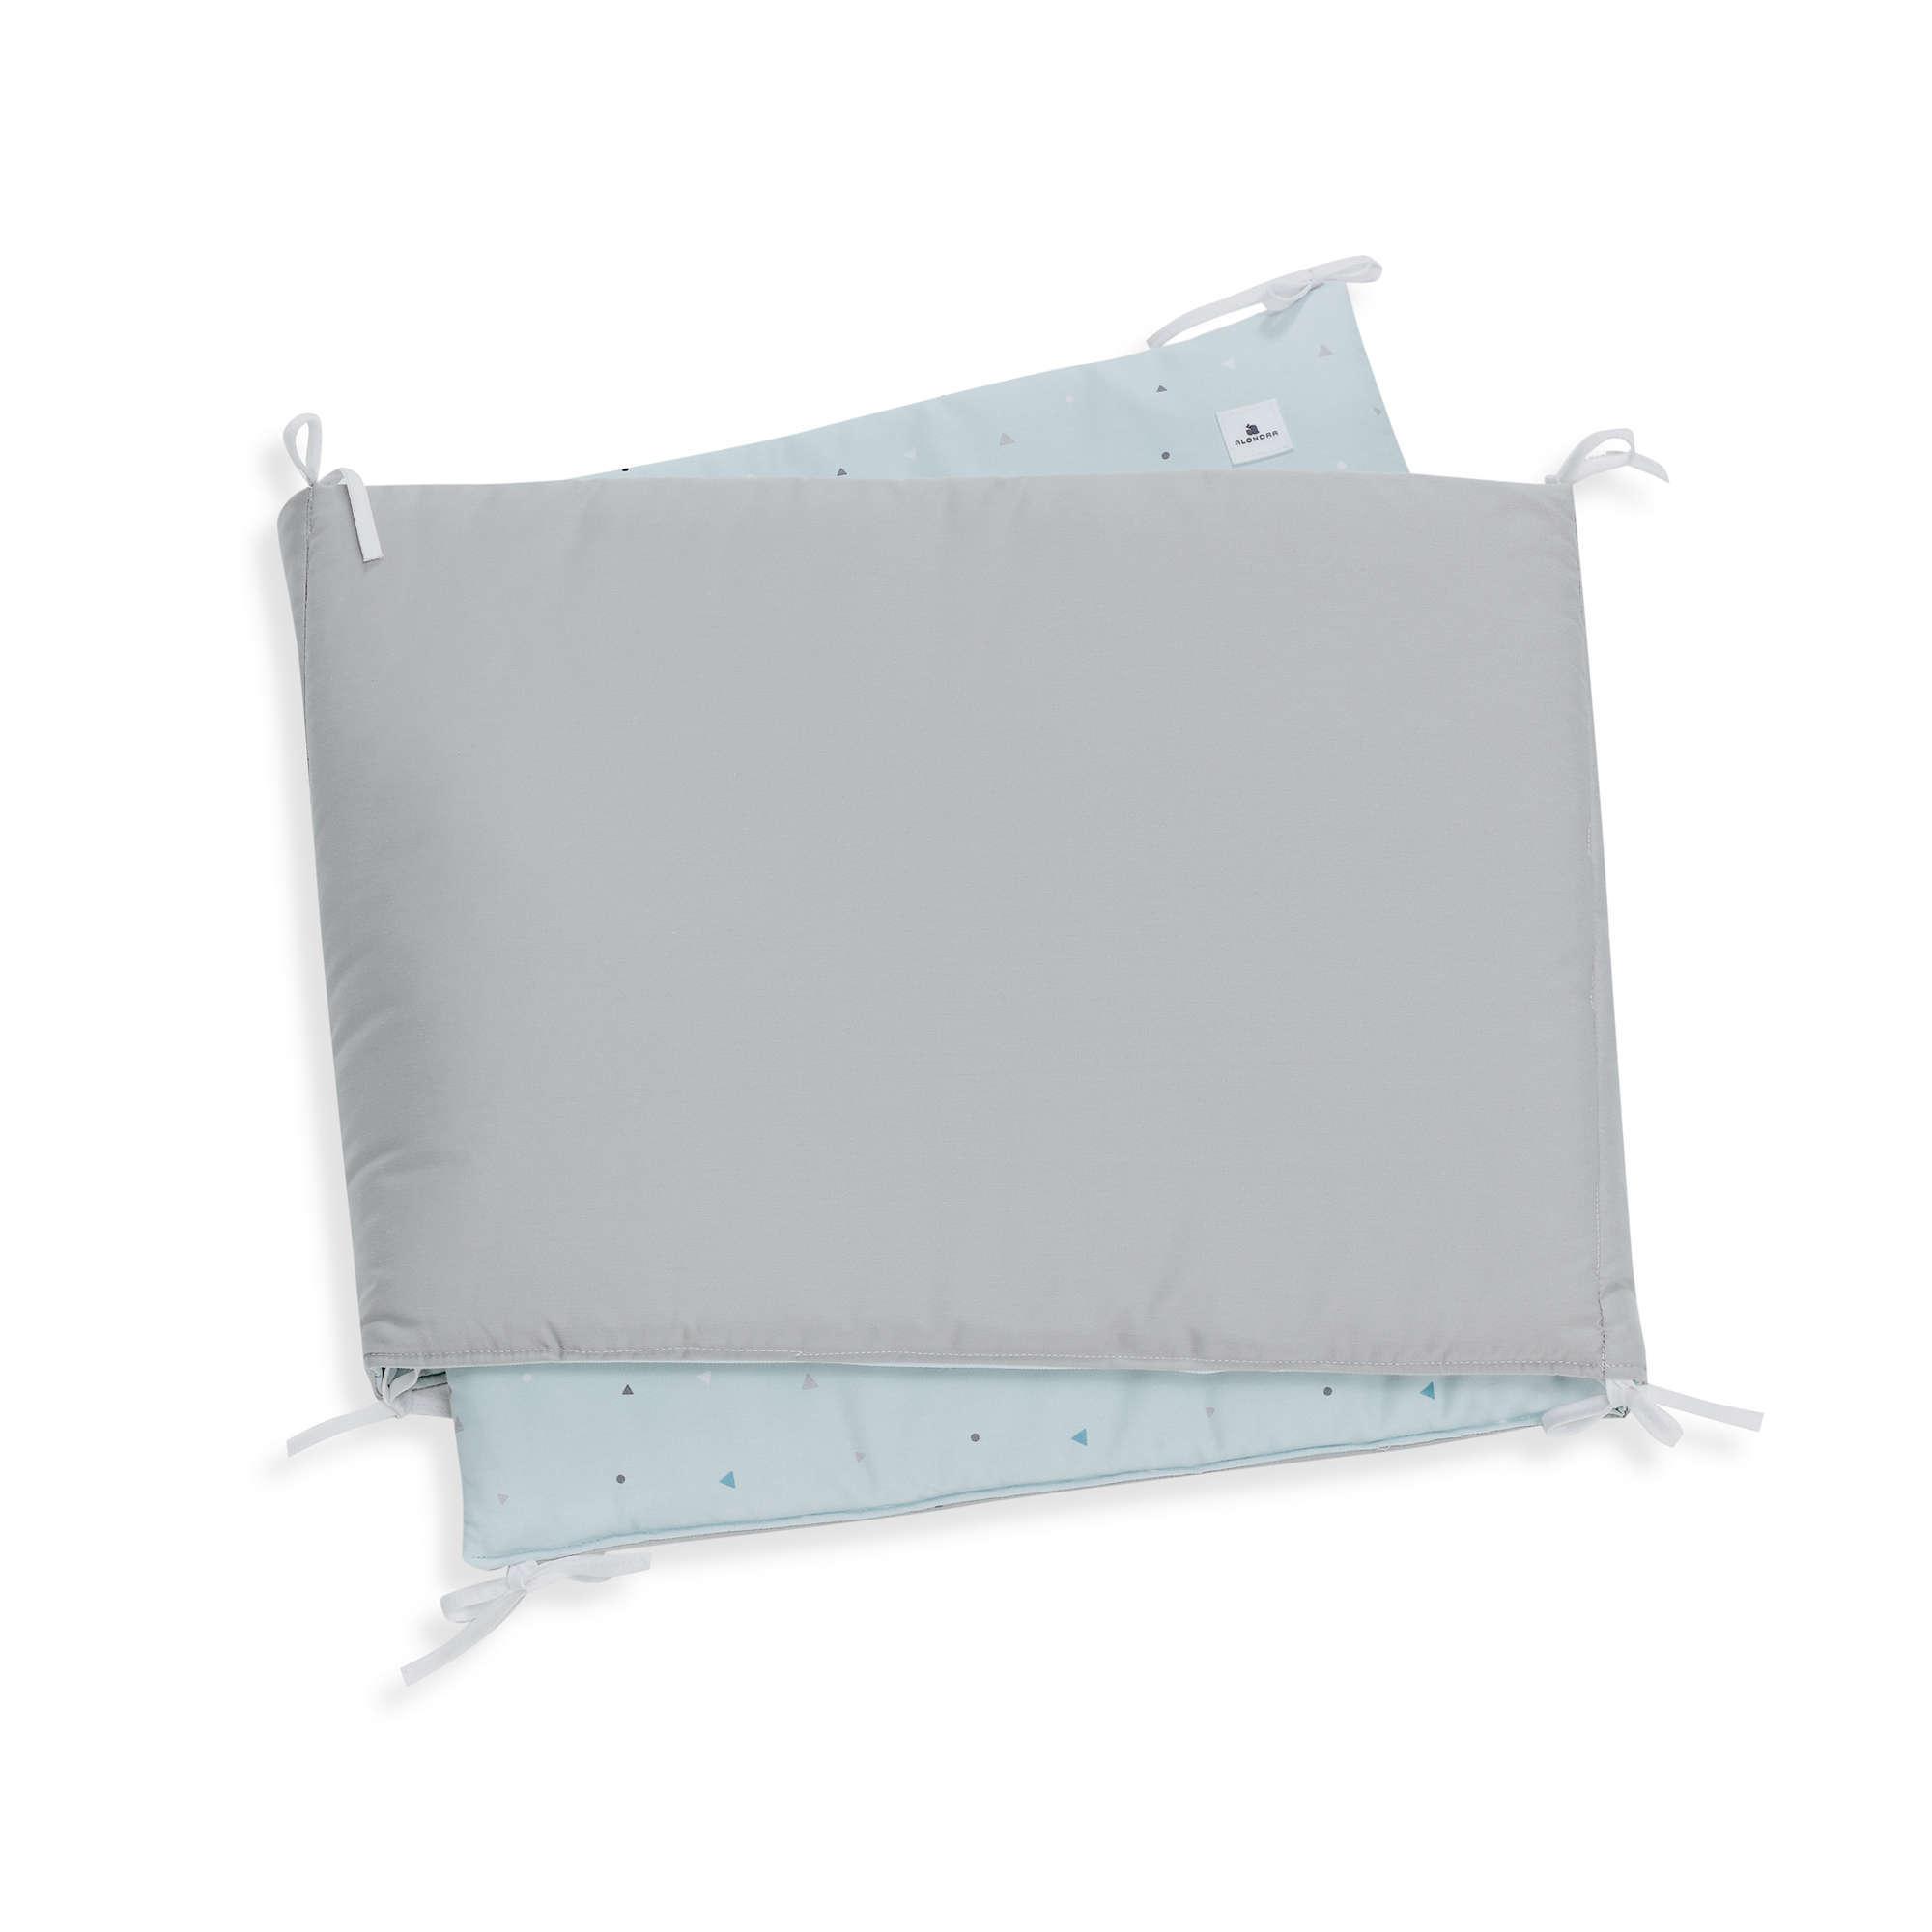 Protector de cuna 60x120cm reversible